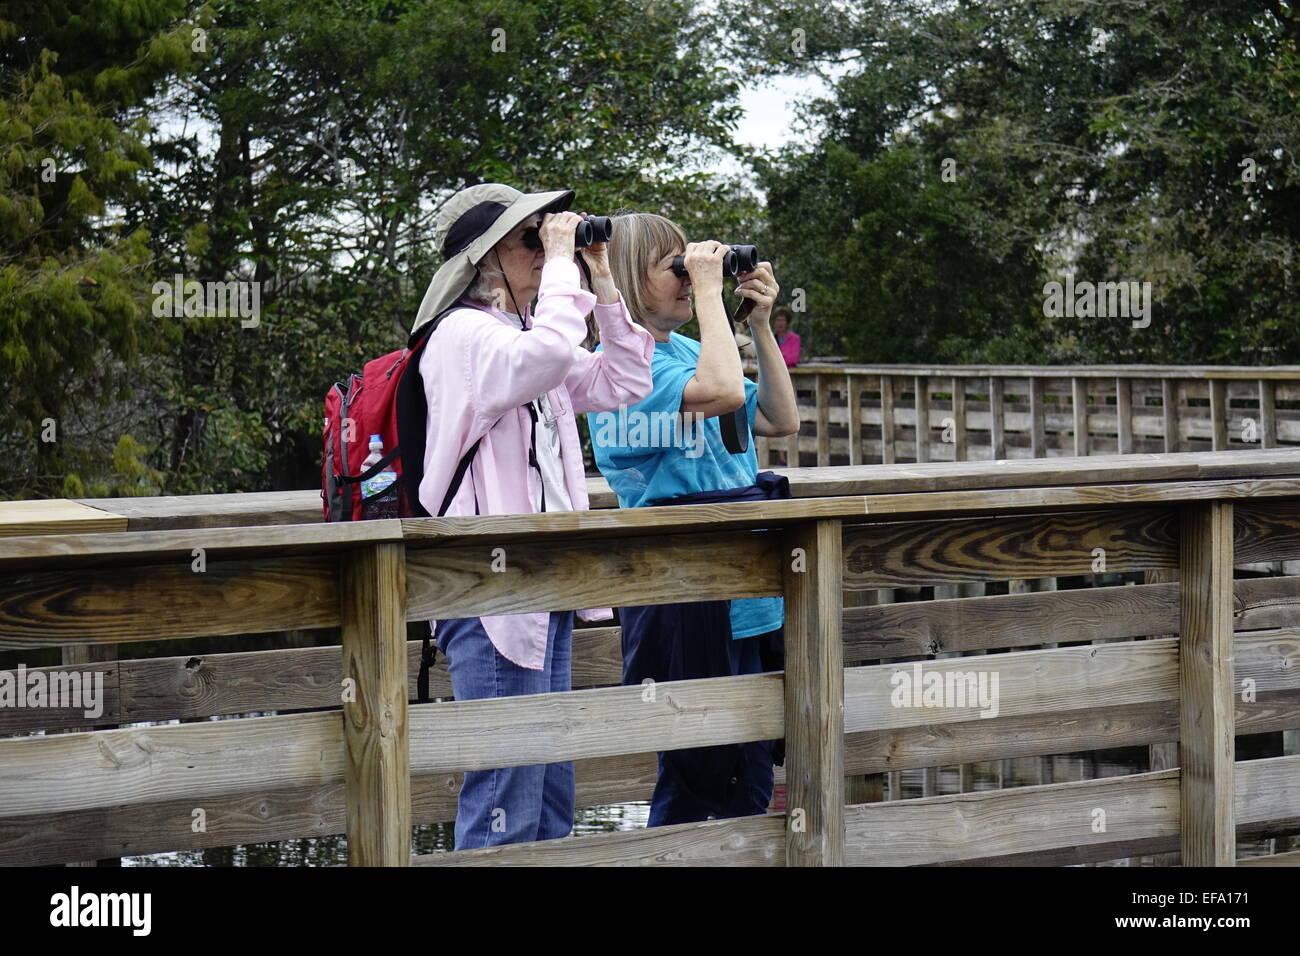 Birdwatchers at Wakodahatchee Wetlands, Delray Beach, Palm Beach County, Florida - Stock Image